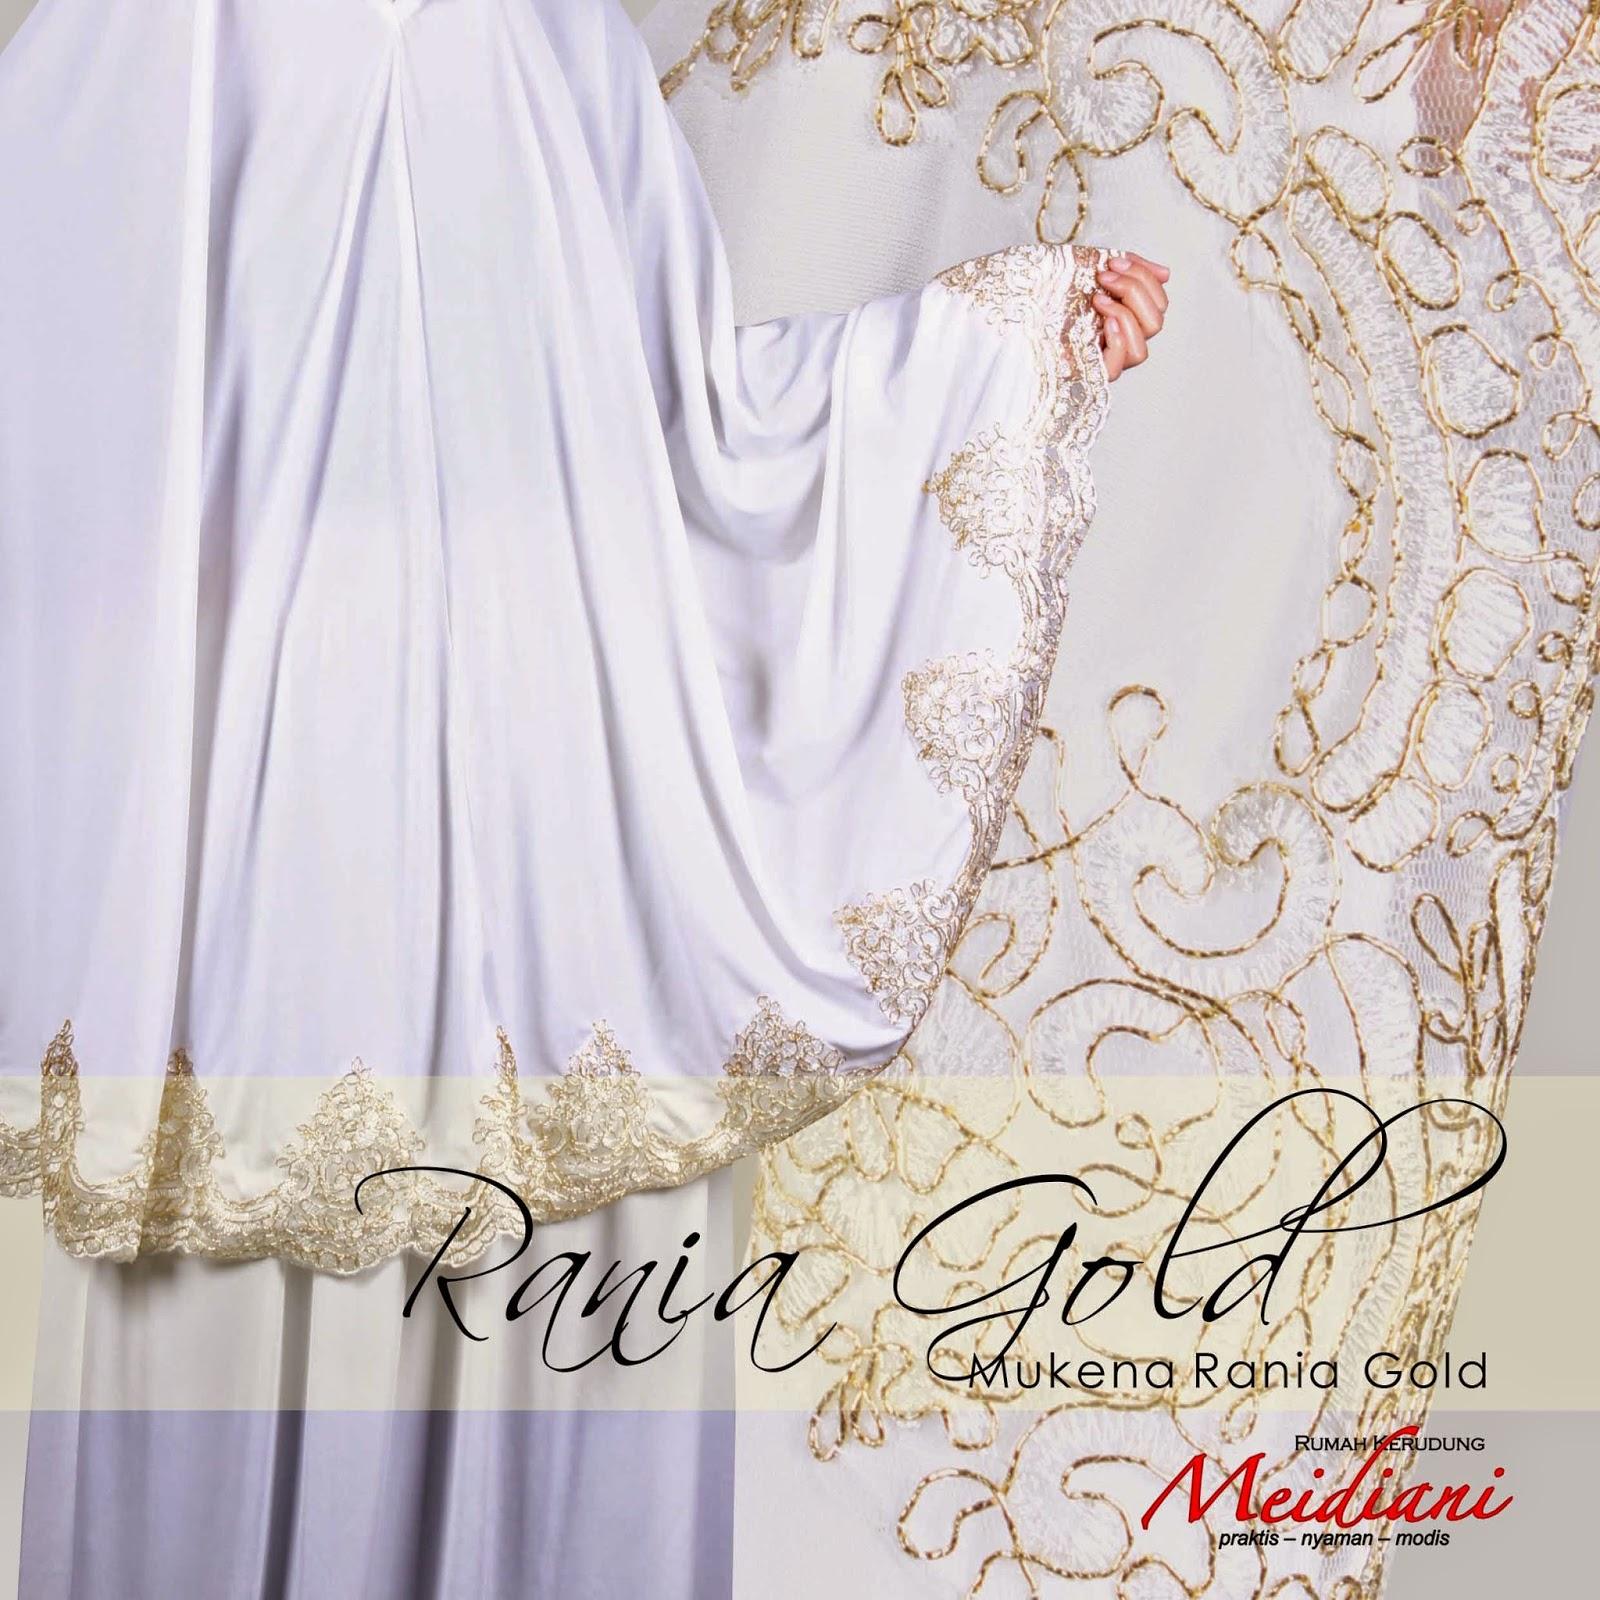 Mukena Rania Gold